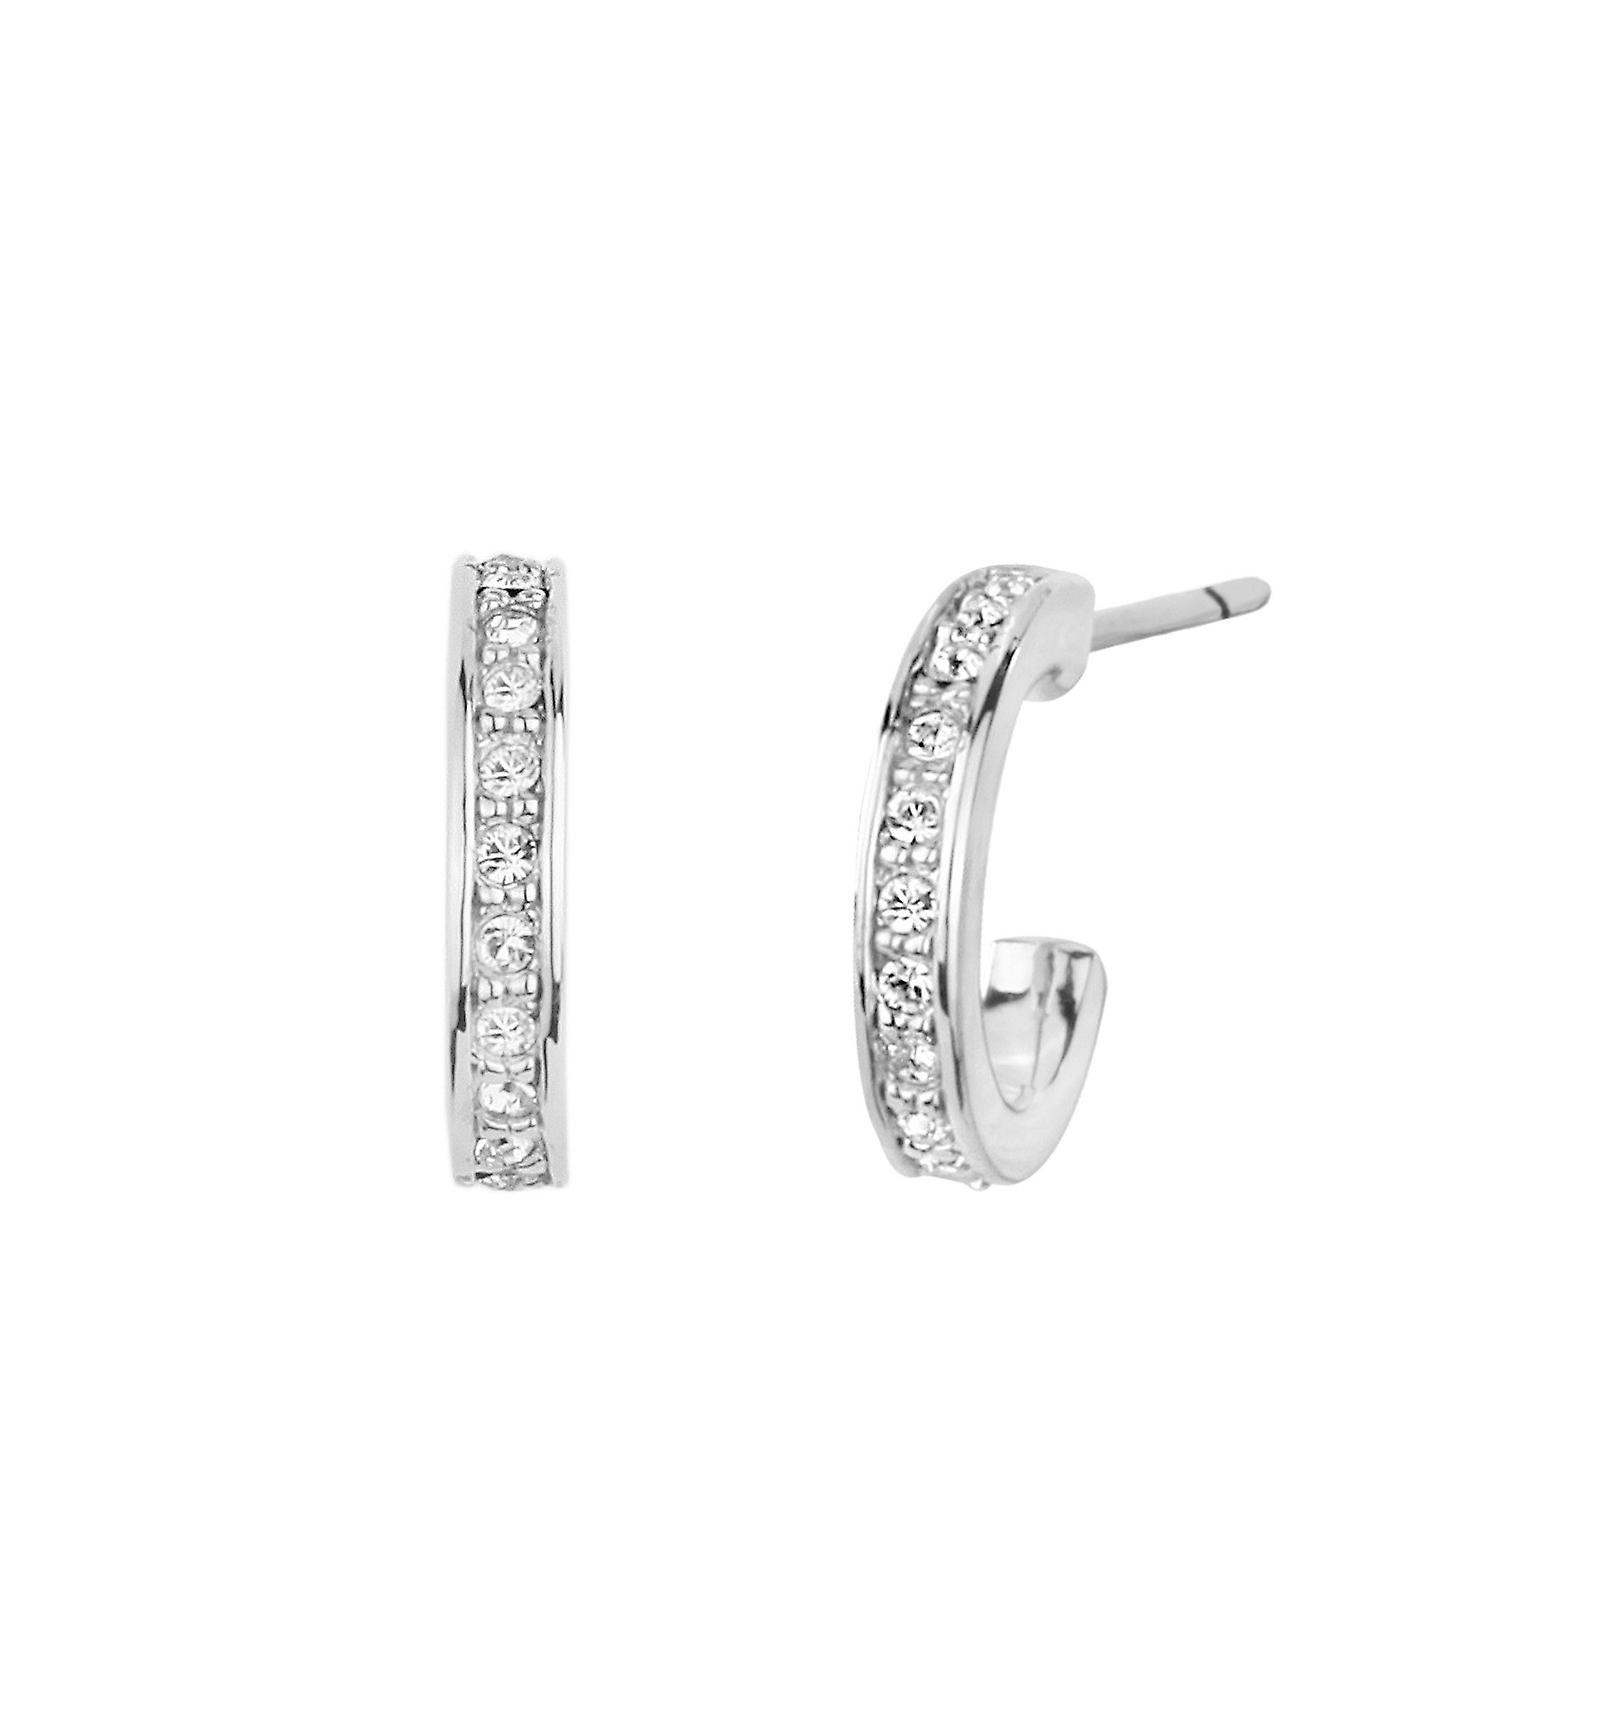 Traveller hoop earring - rhodium plated - Swarovski Crystals - 11mm - 157122